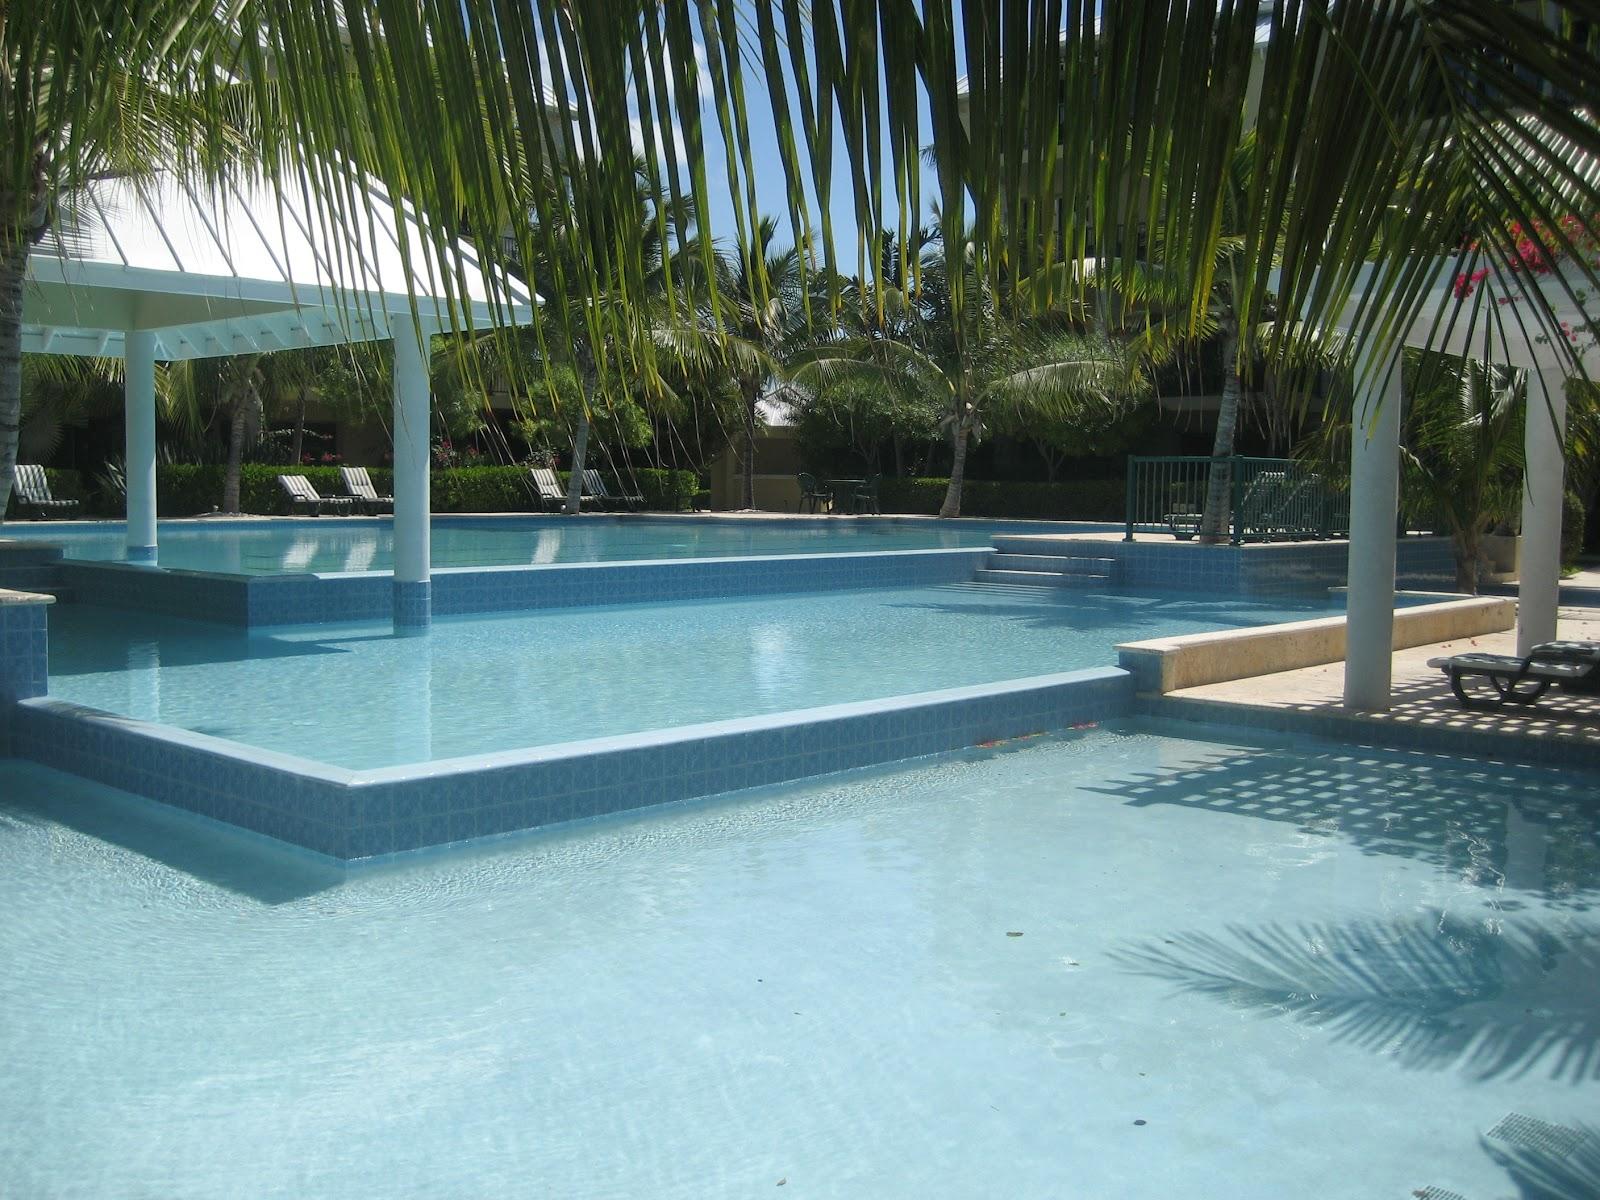 Pool Tile Oc Corona Del Mar Pool Tile Cleaning 888 296 2474